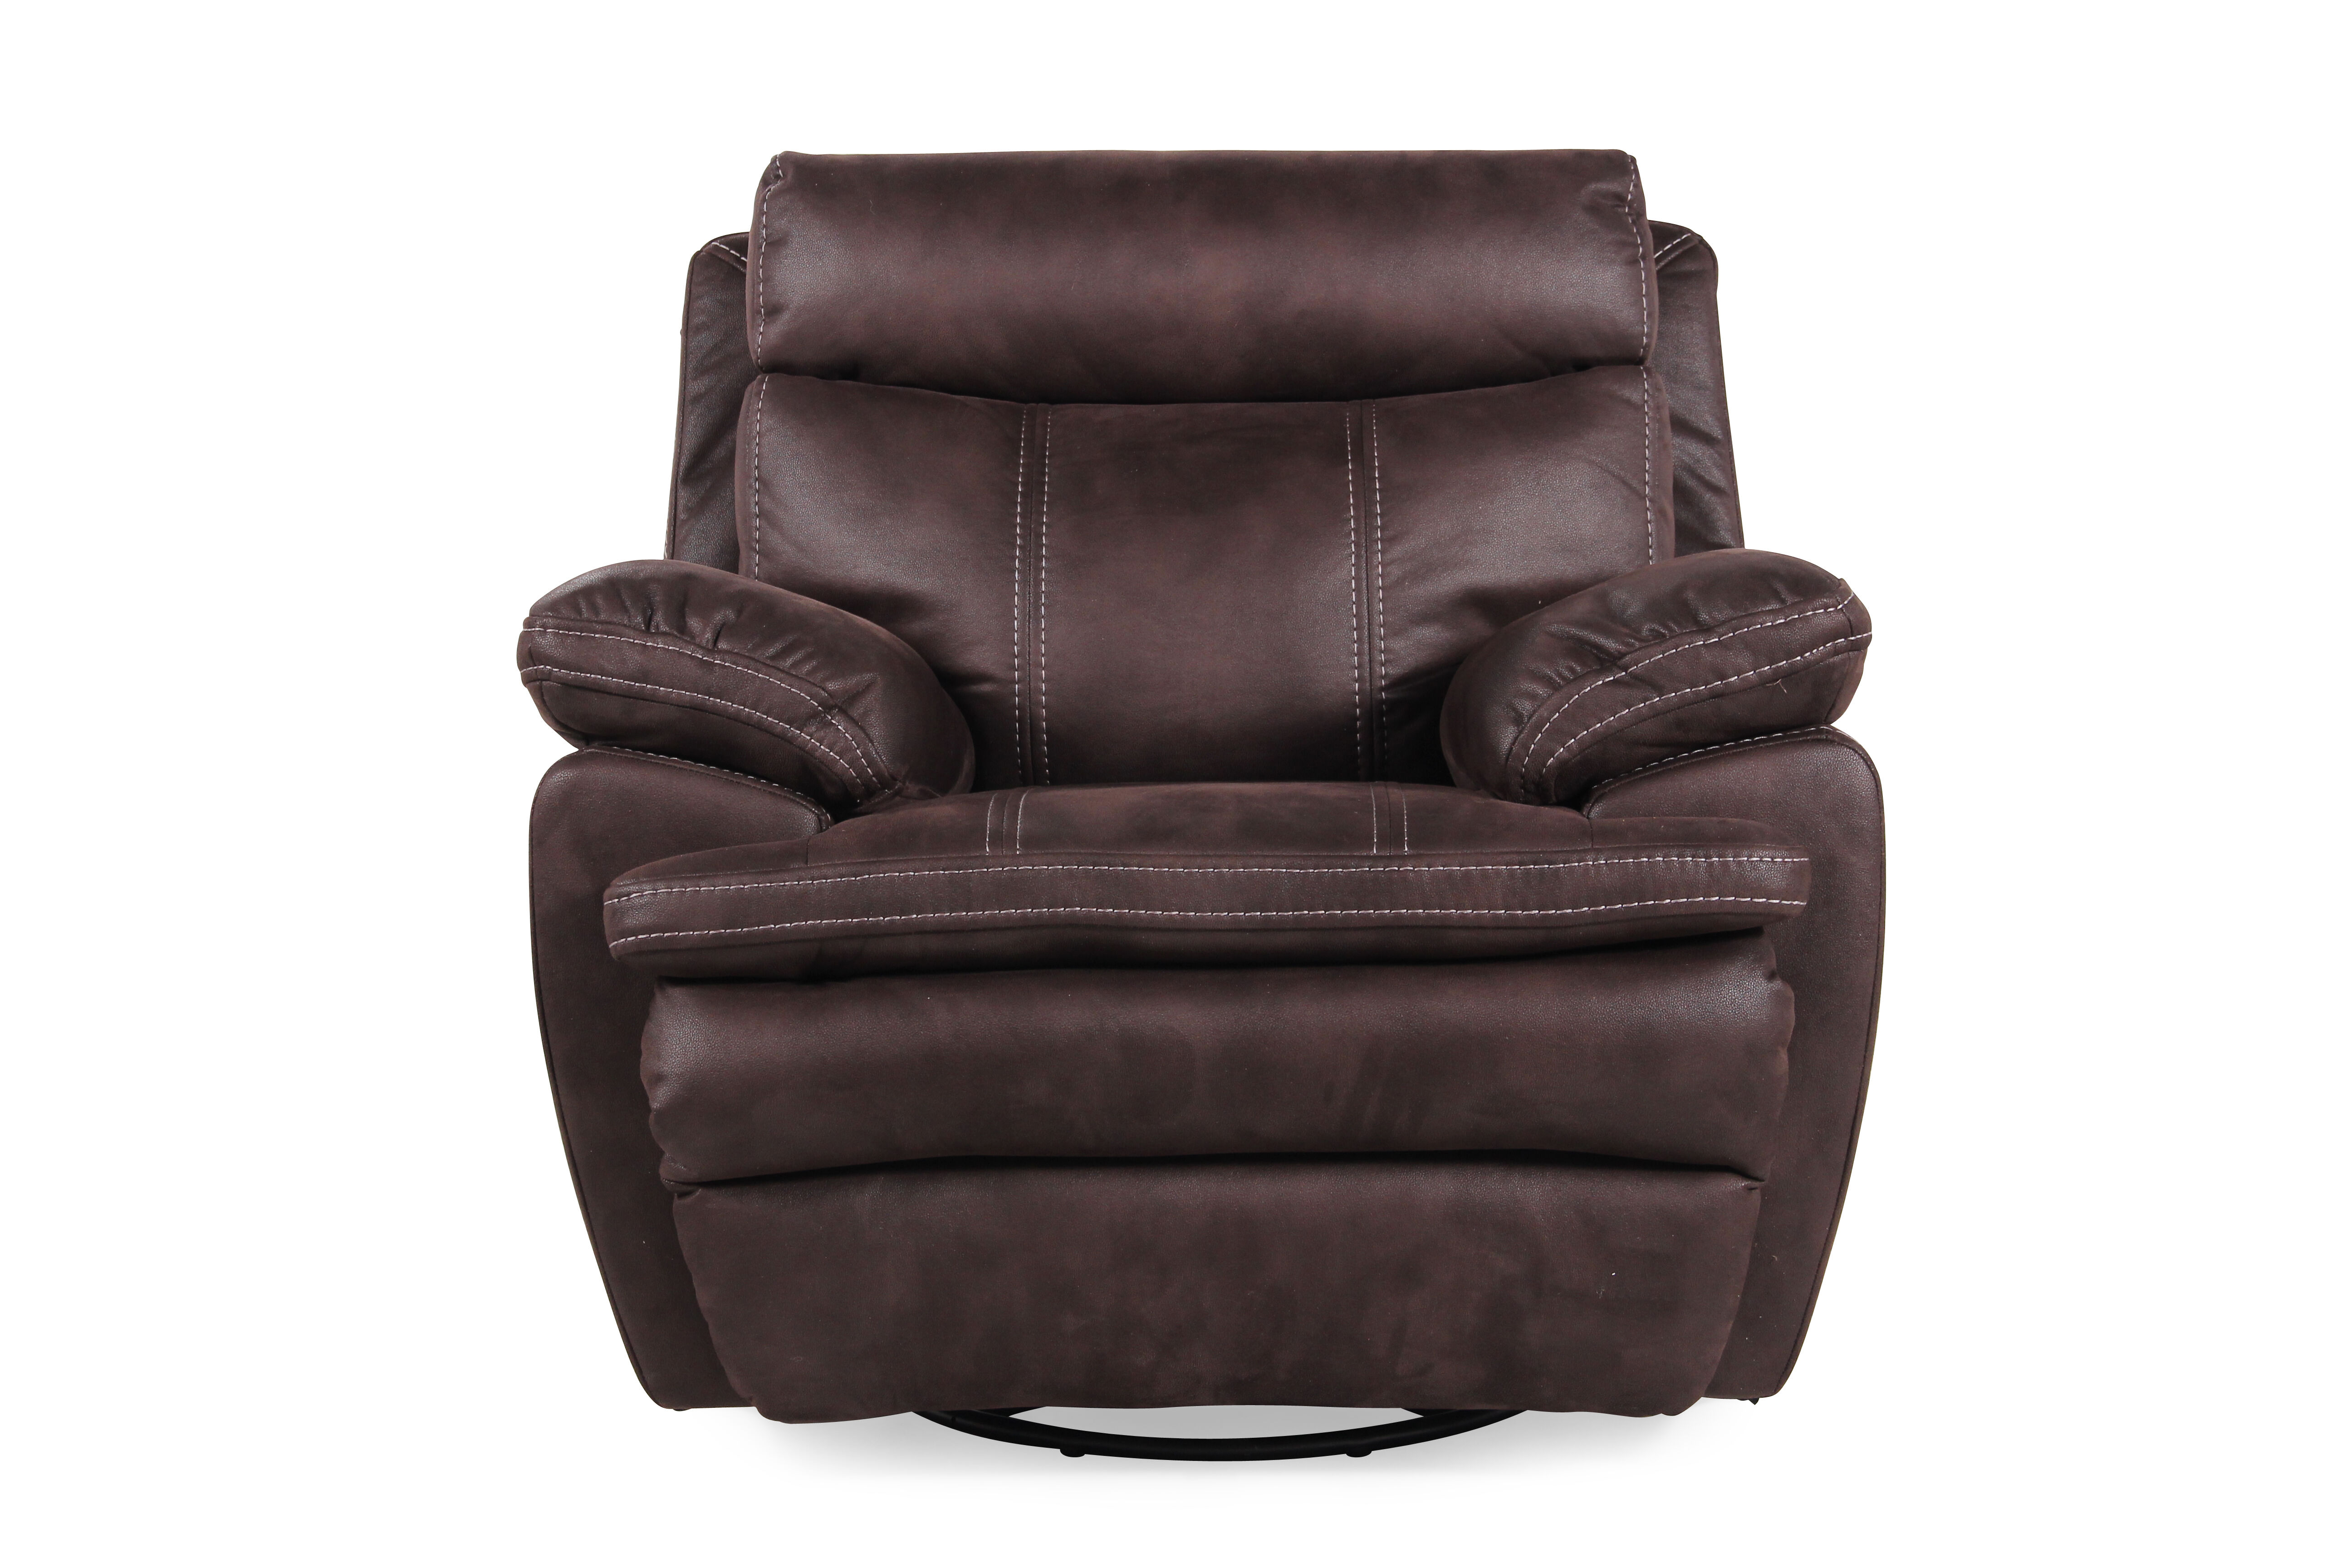 boulevard brown swivel glider recliner